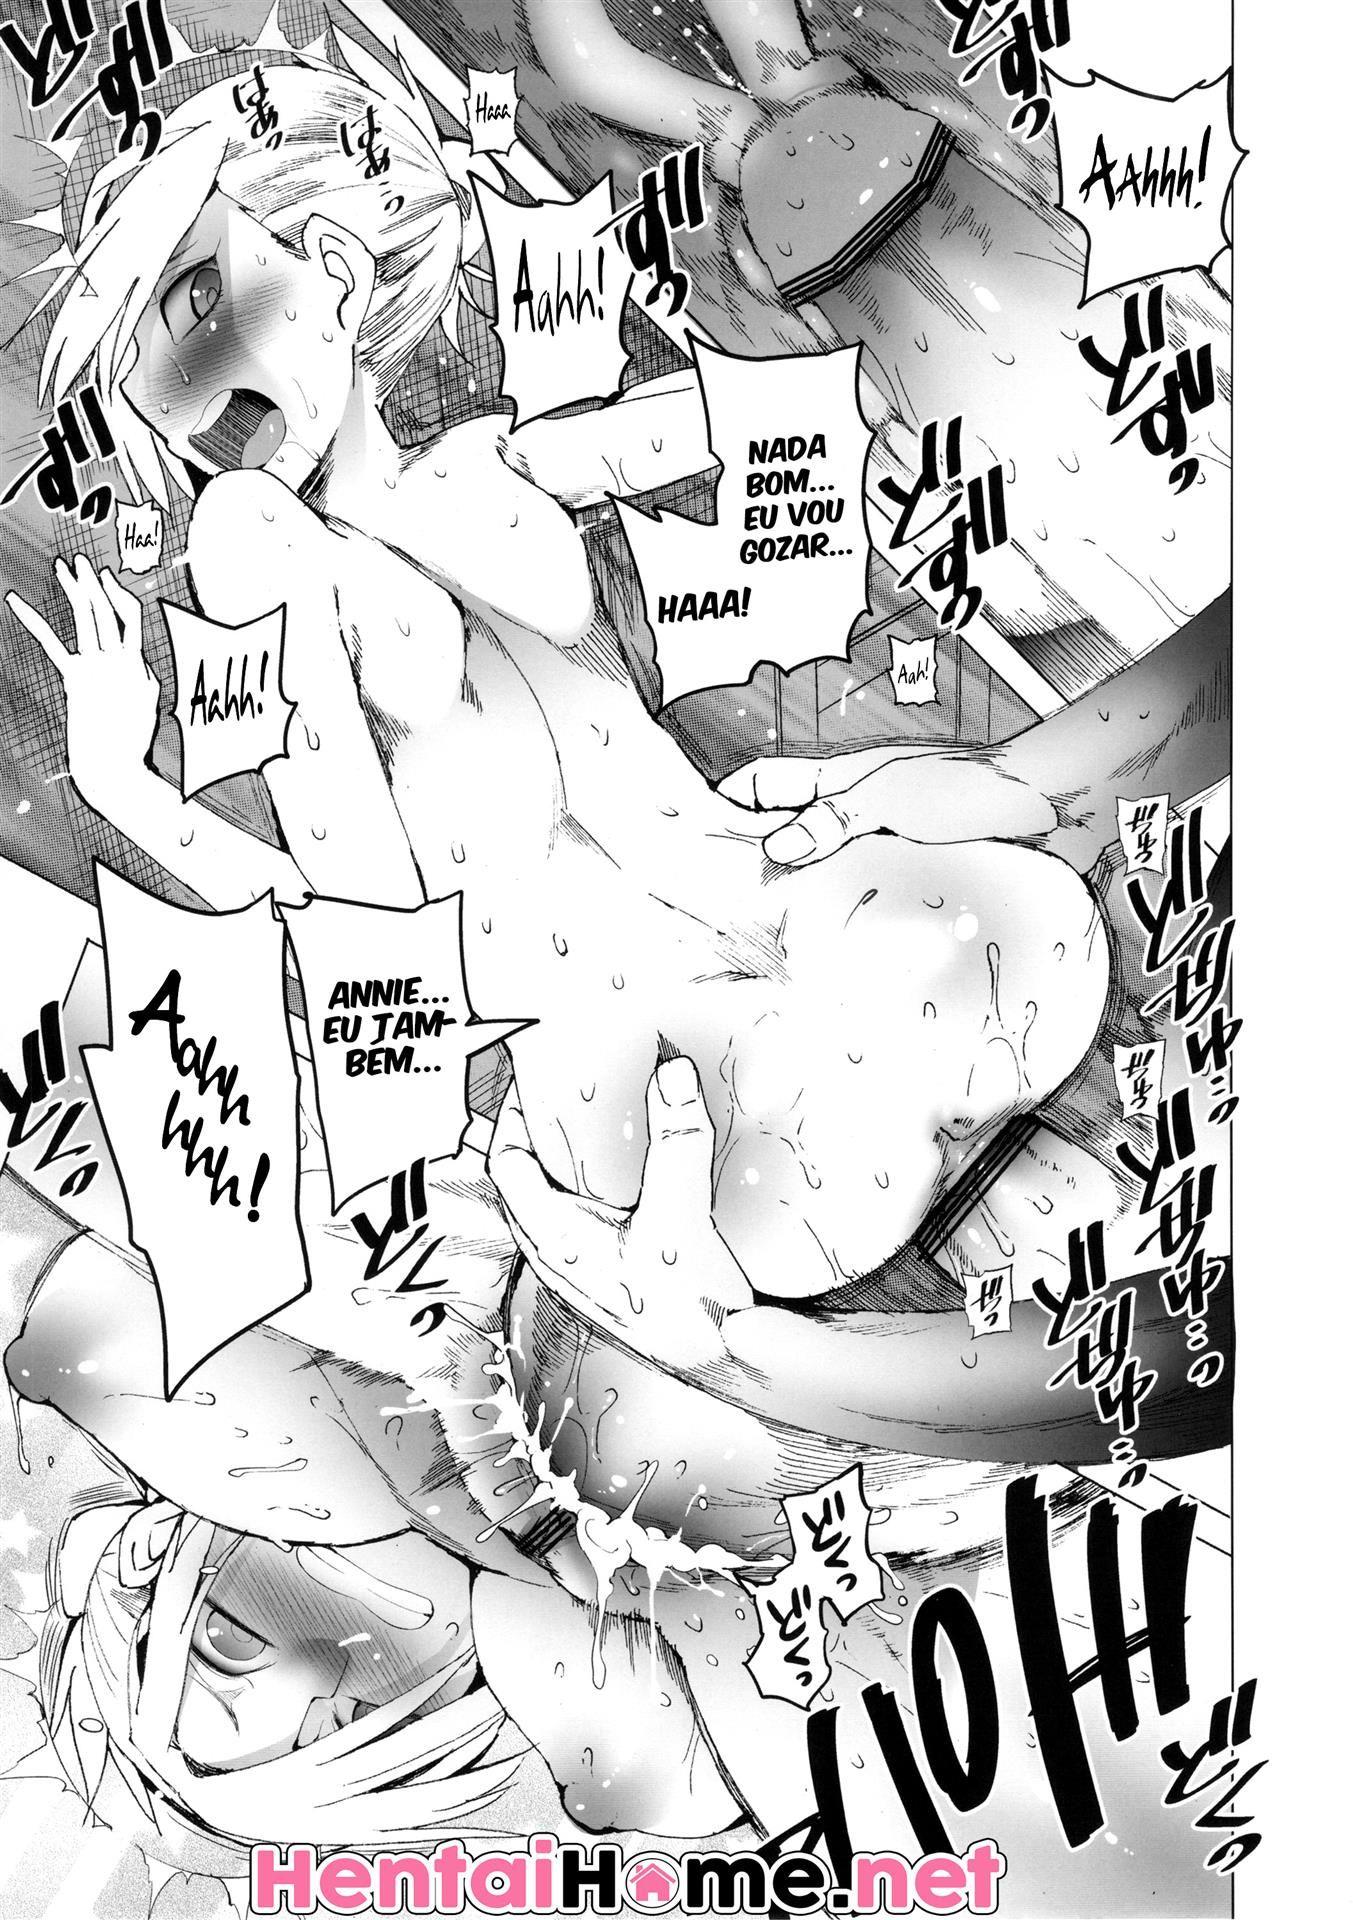 Attack on Titan Pornô: Annie você fede!